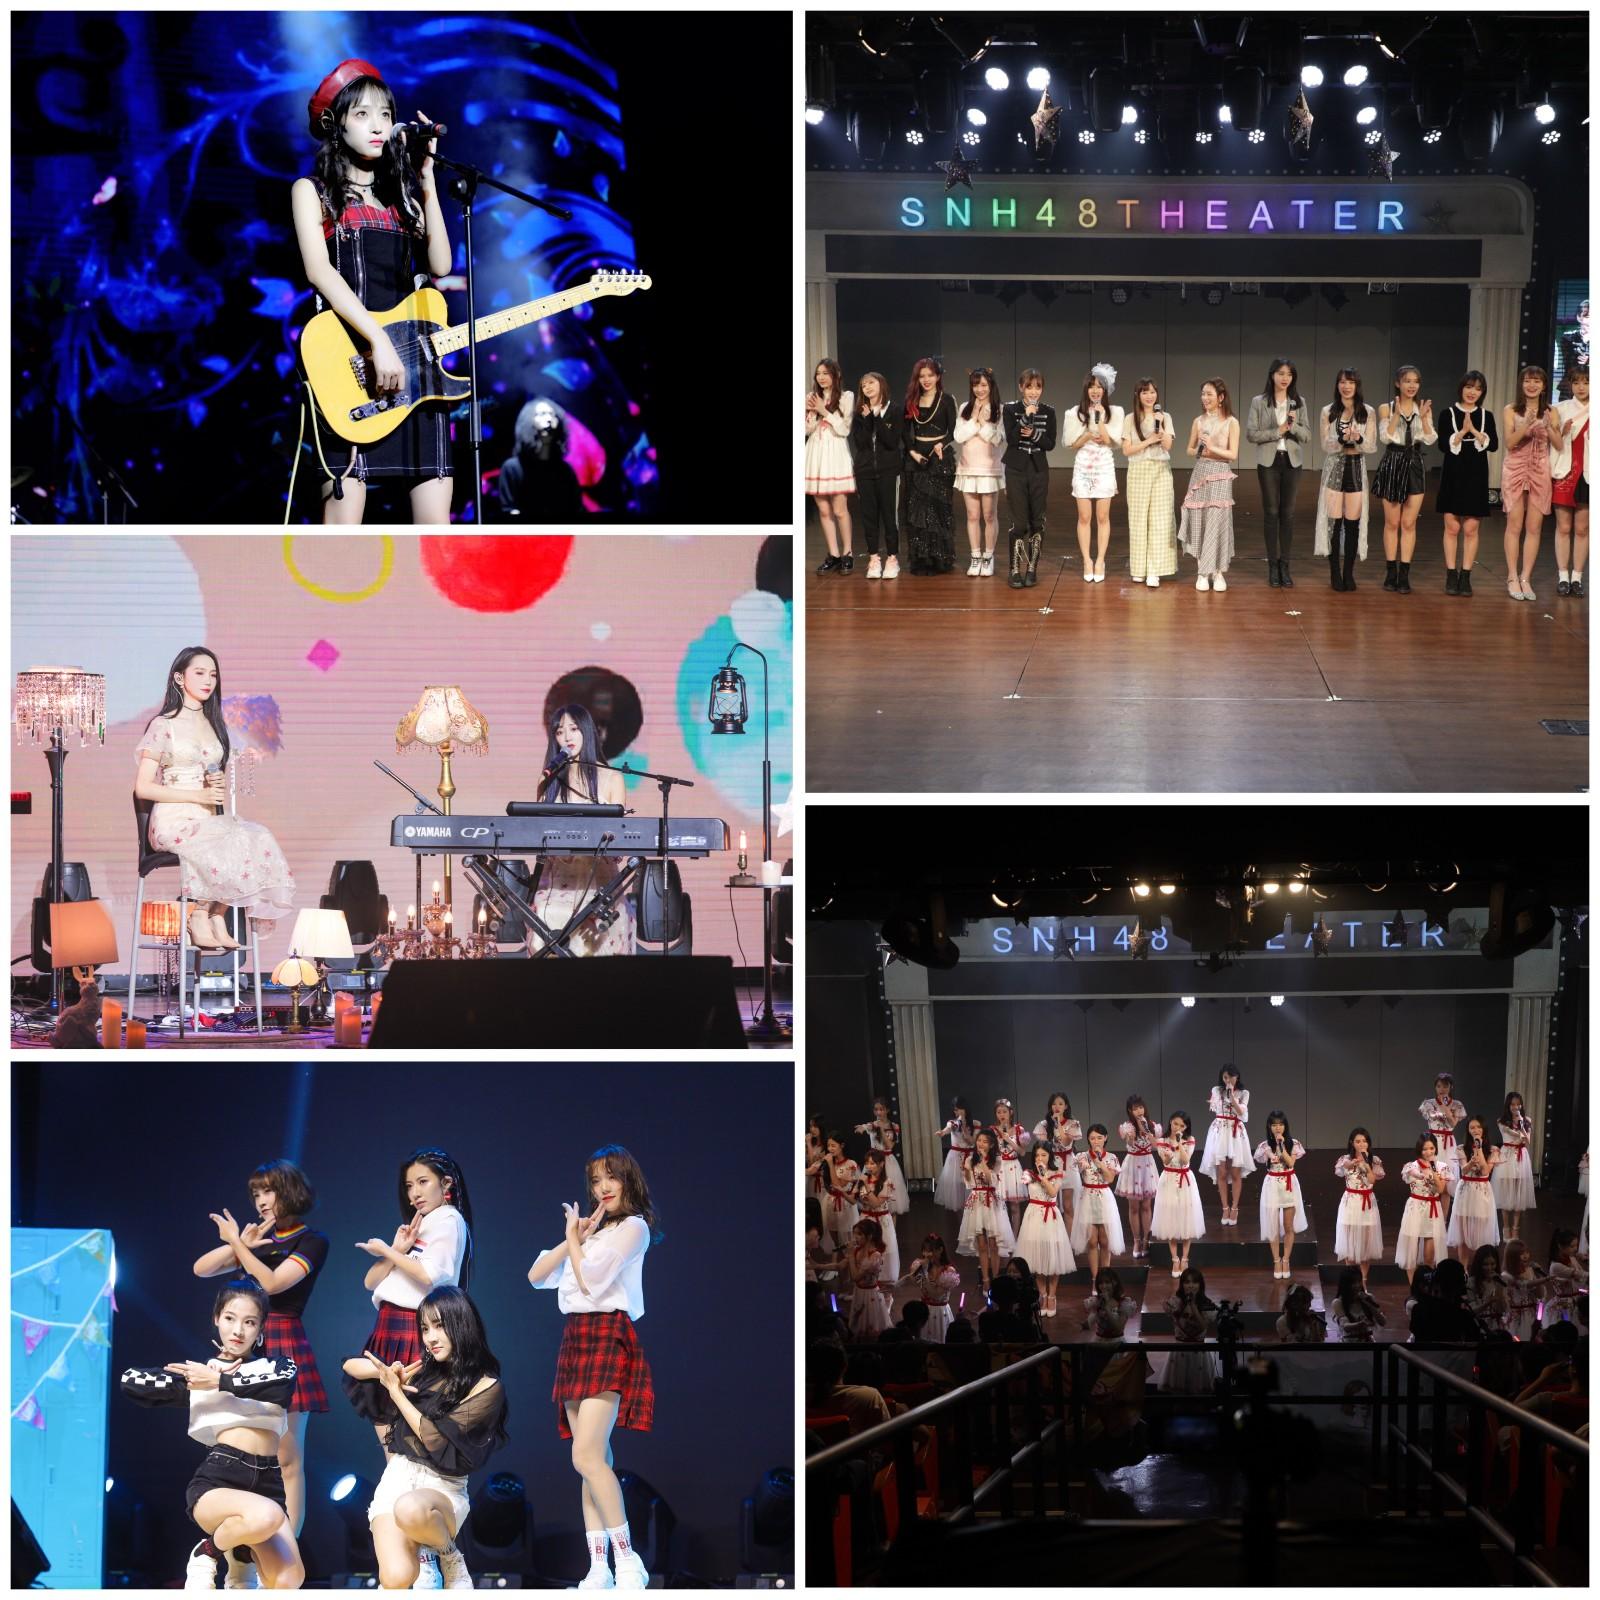 SNH48星梦剧院五周年庆典圆满落幕 数百万粉丝共同守护梦想